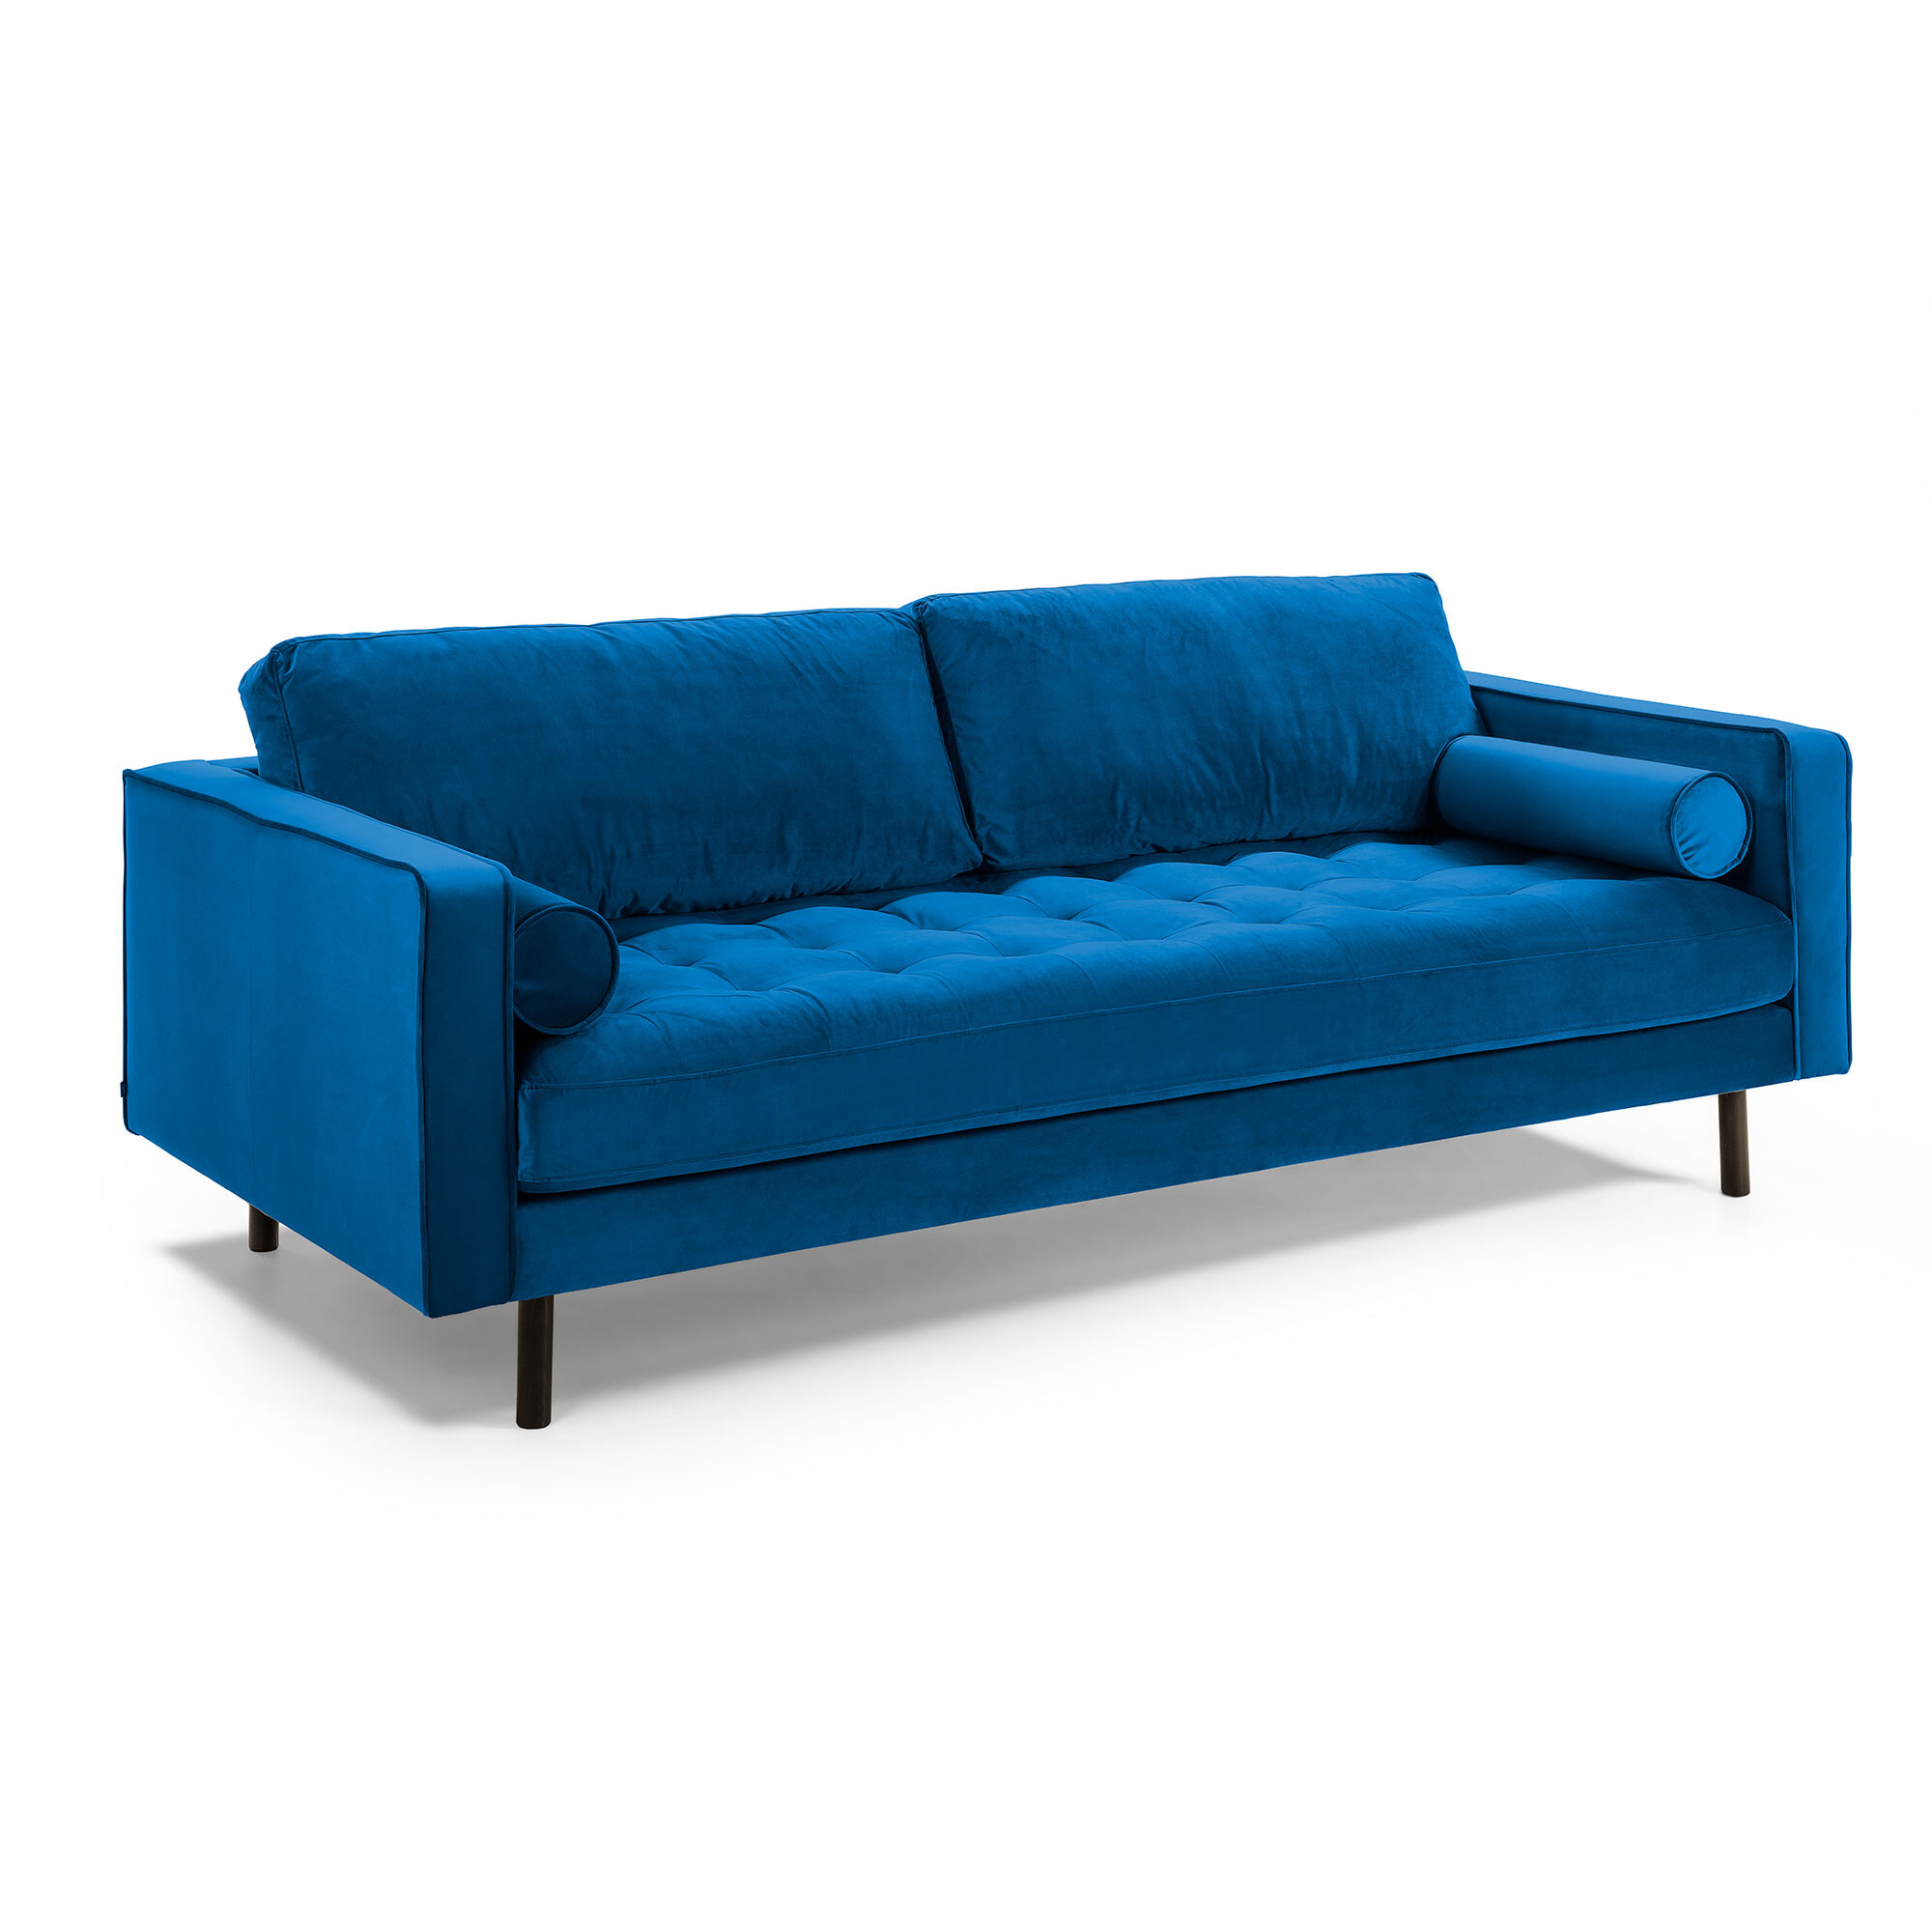 Kave Home Tweezitsbank 'Debra' Velvet, kleur Donkerblauw